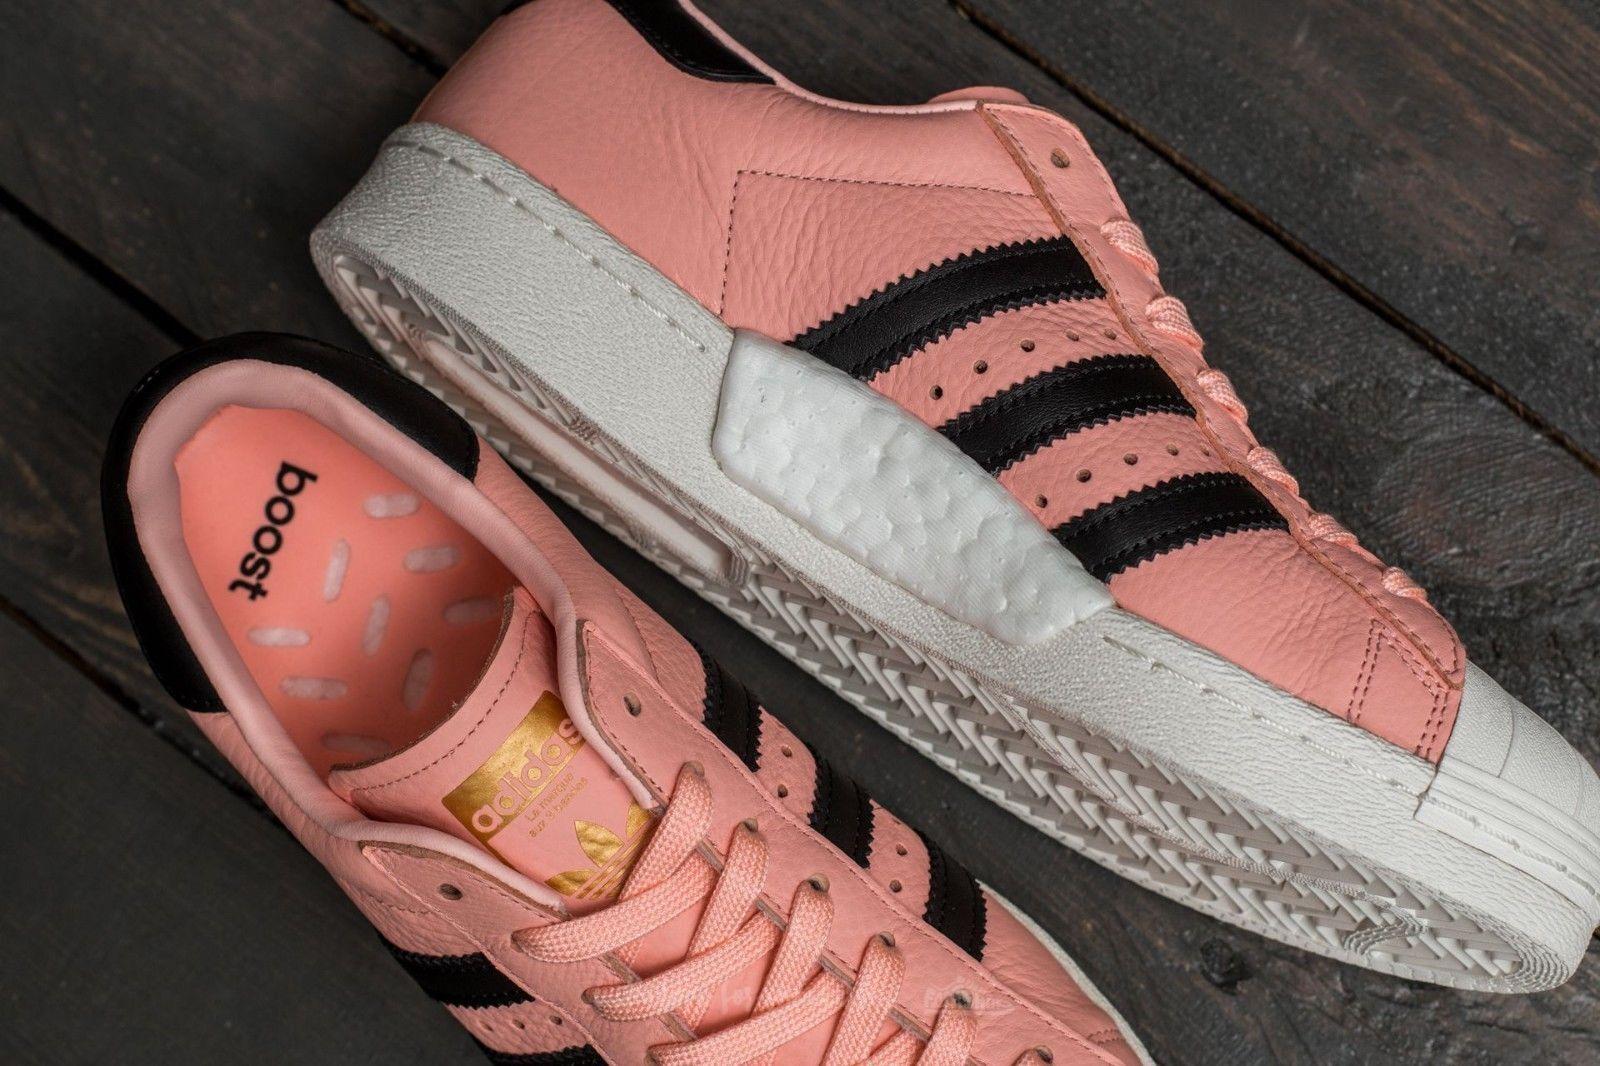 Adidas Originals Superstar Boost Mens Running Trainers Sneakers #BB2731